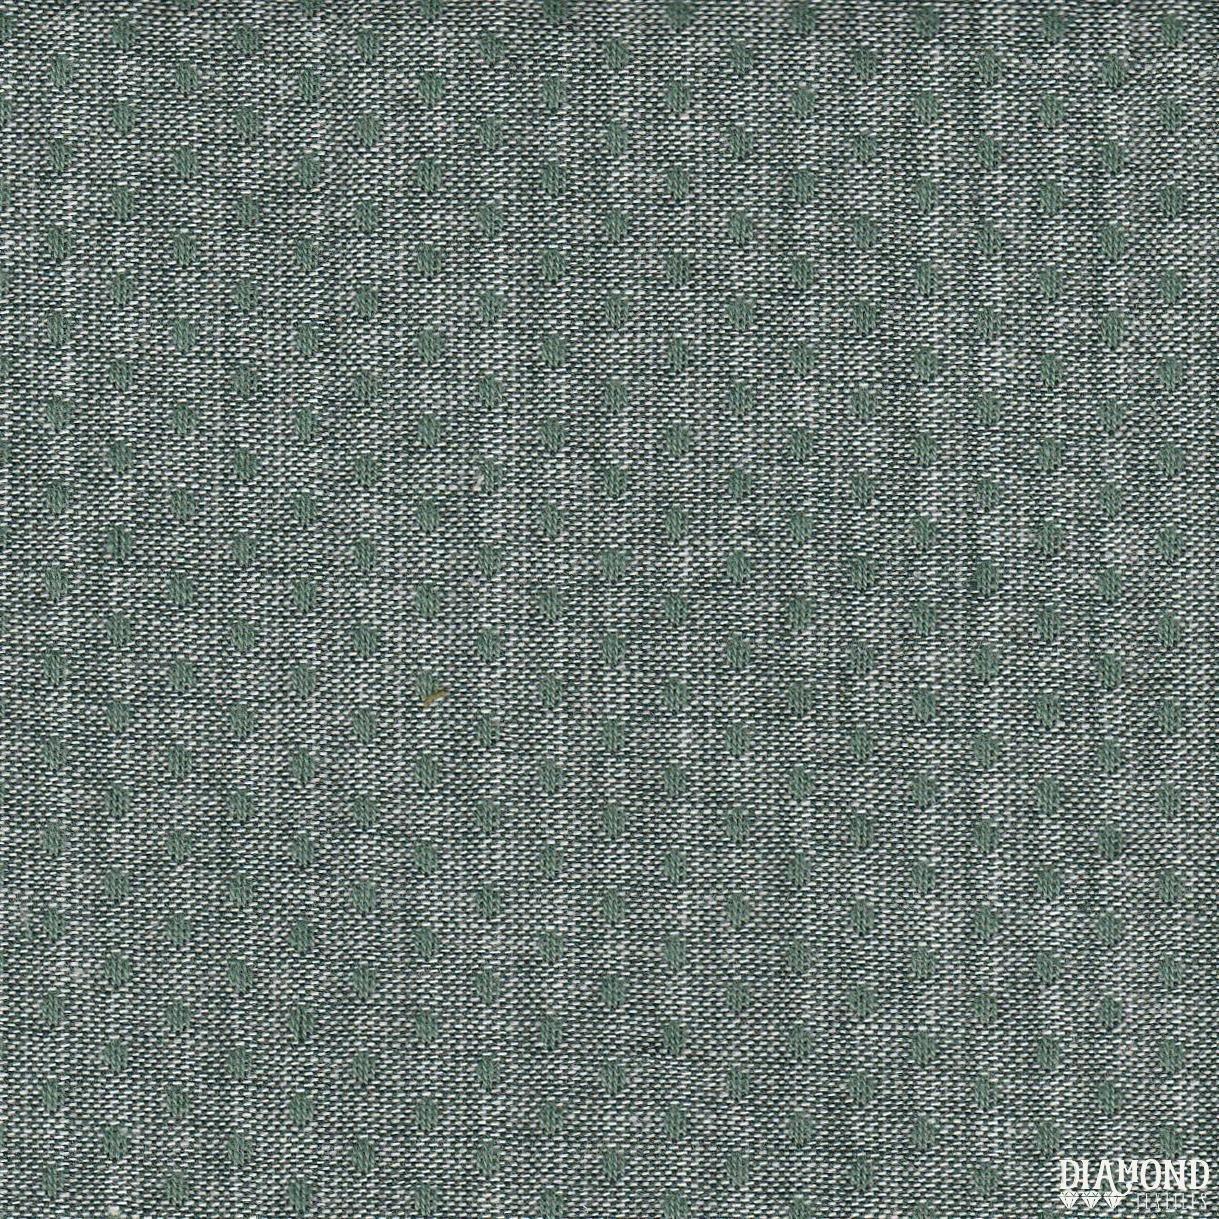 Diamond Textiles Manchester 3140^